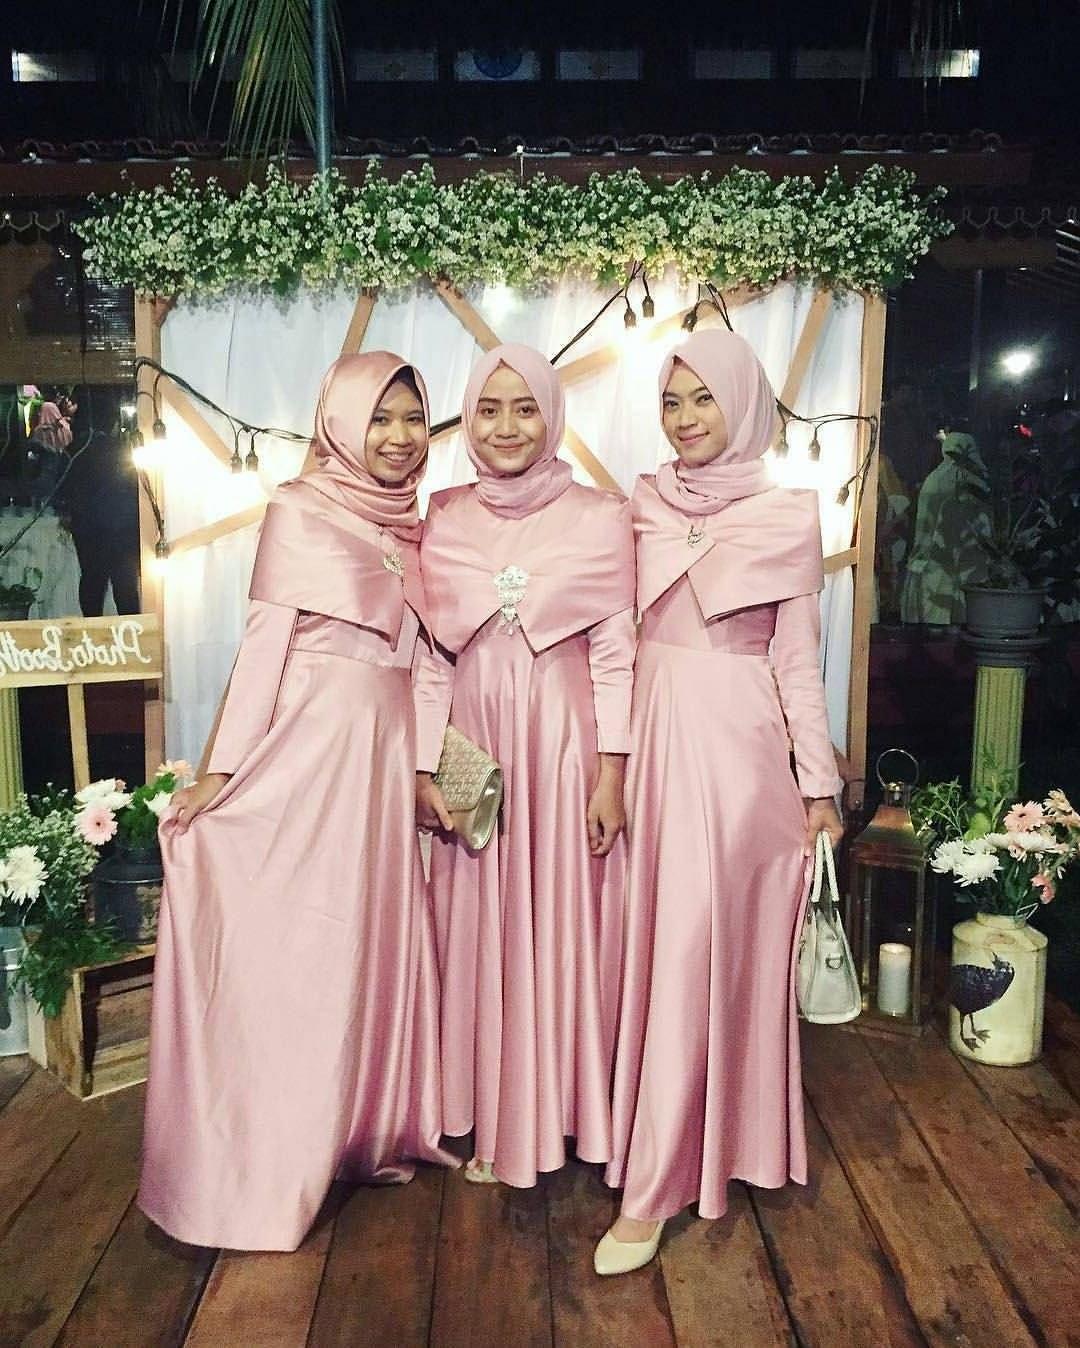 Ide Hijab Bridesmaid U3dh Pin by Sri Widati Resiningrum soecipto soeryopoetro On Baju2